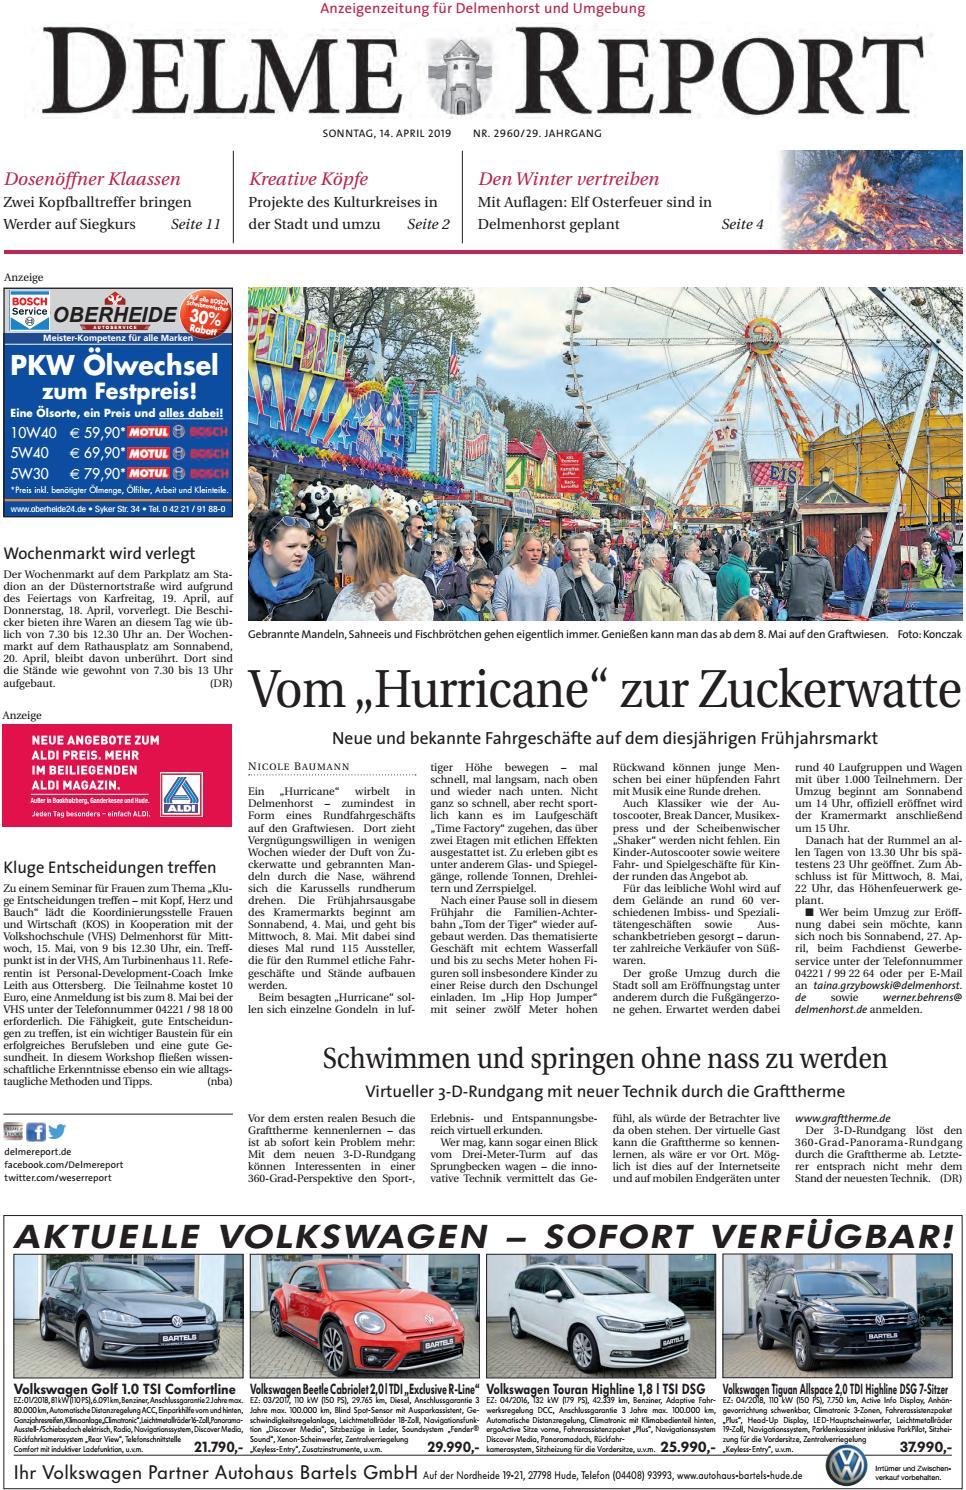 Delme Report vom 14.04.2019 by KPS Verlagsgesellschaft mbH - issuu